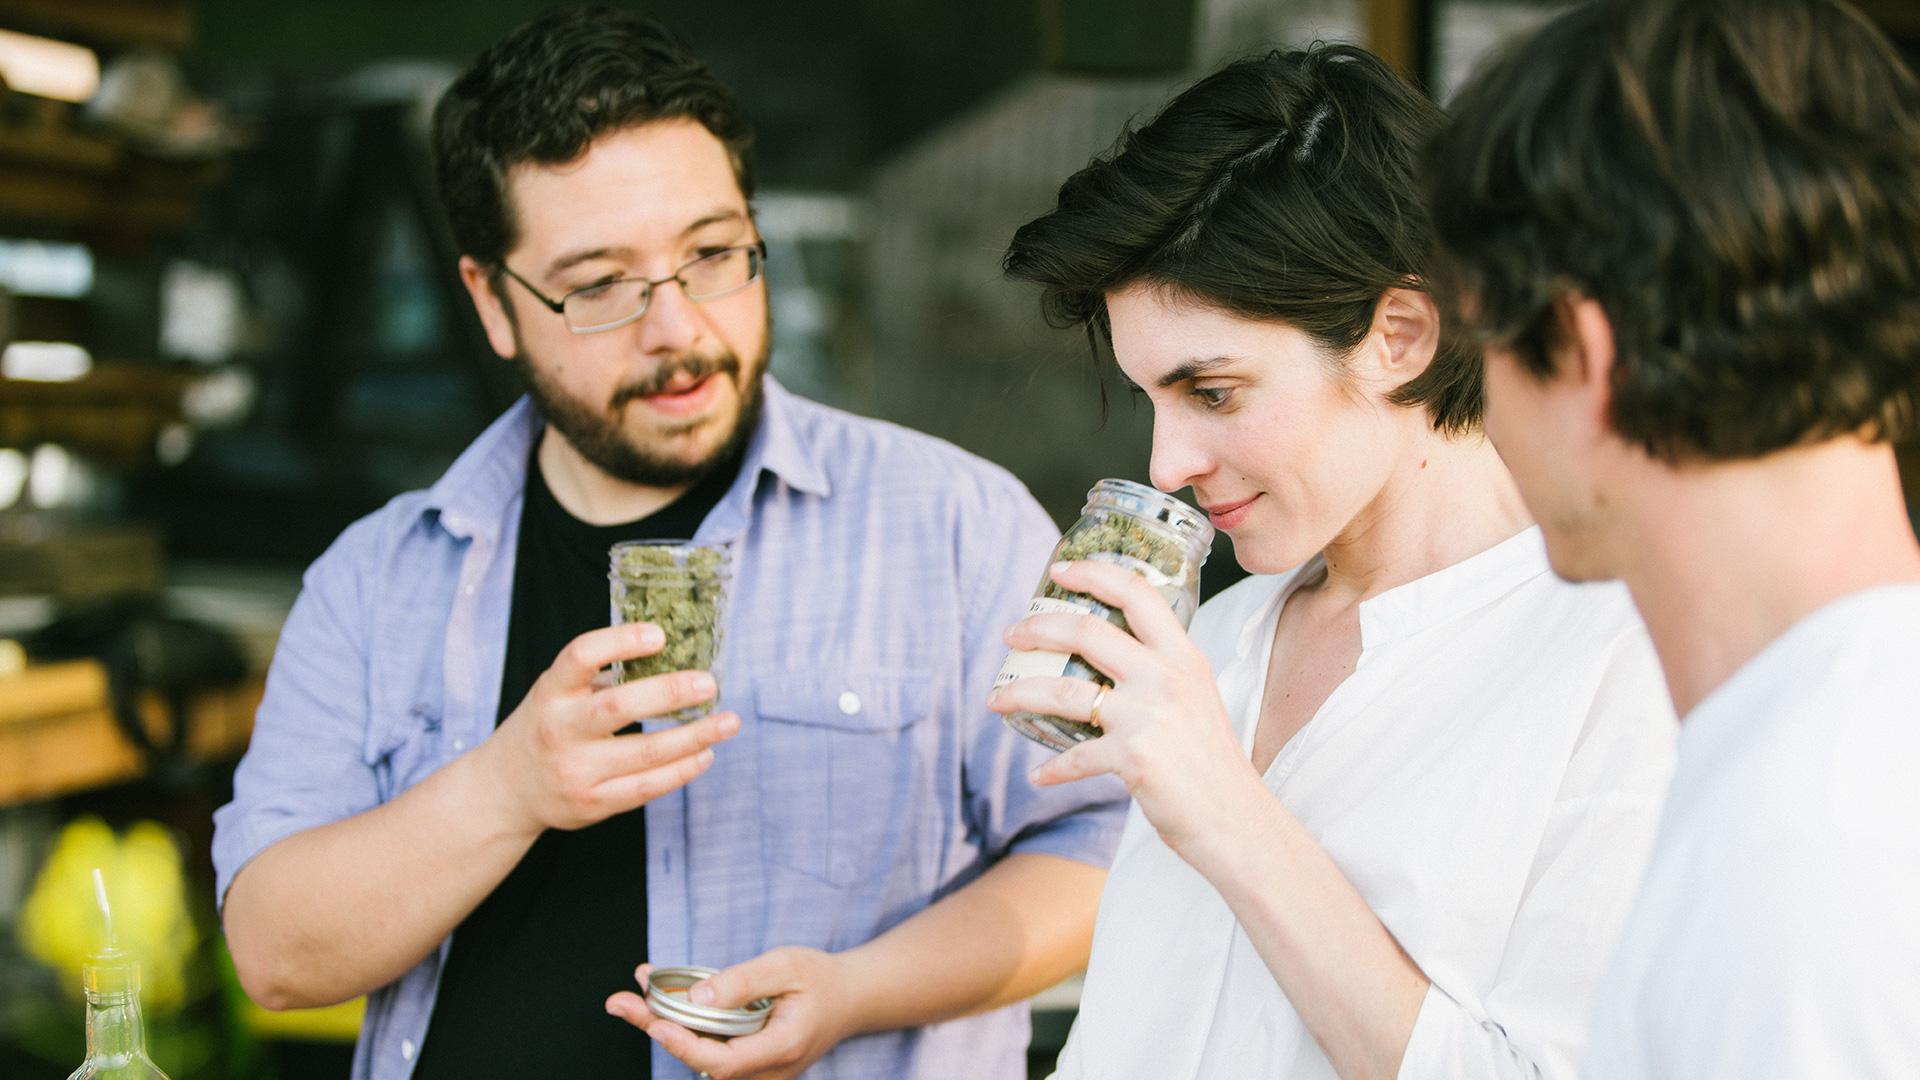 Nya datingsidor för januari 2011 image 7